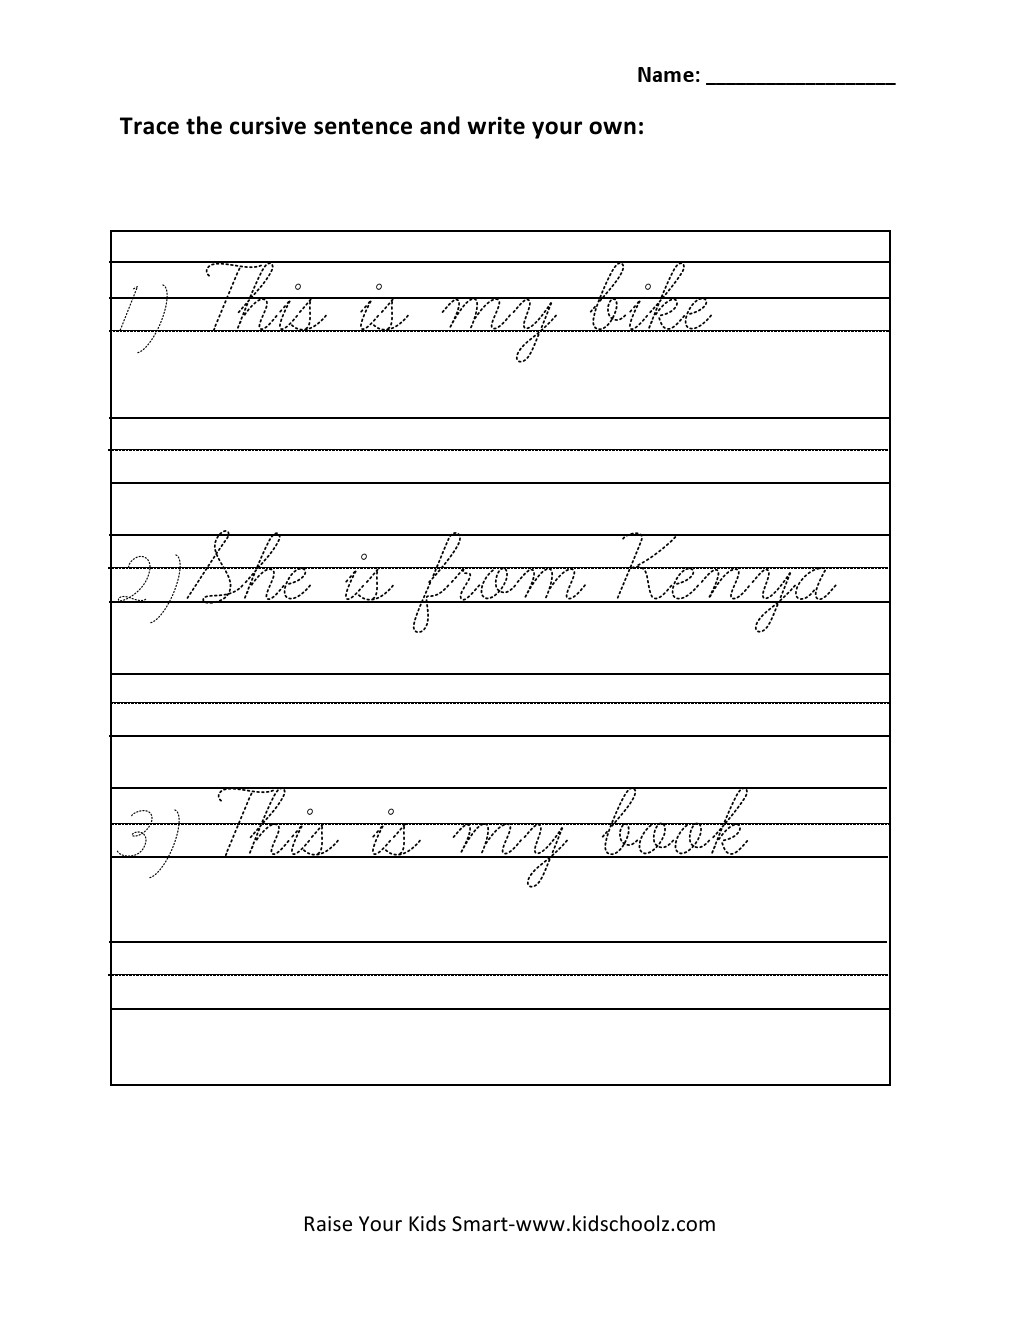 hight resolution of Grade 1 - Cursive Writing Sentences Worksheet 5 - Kidschoolz